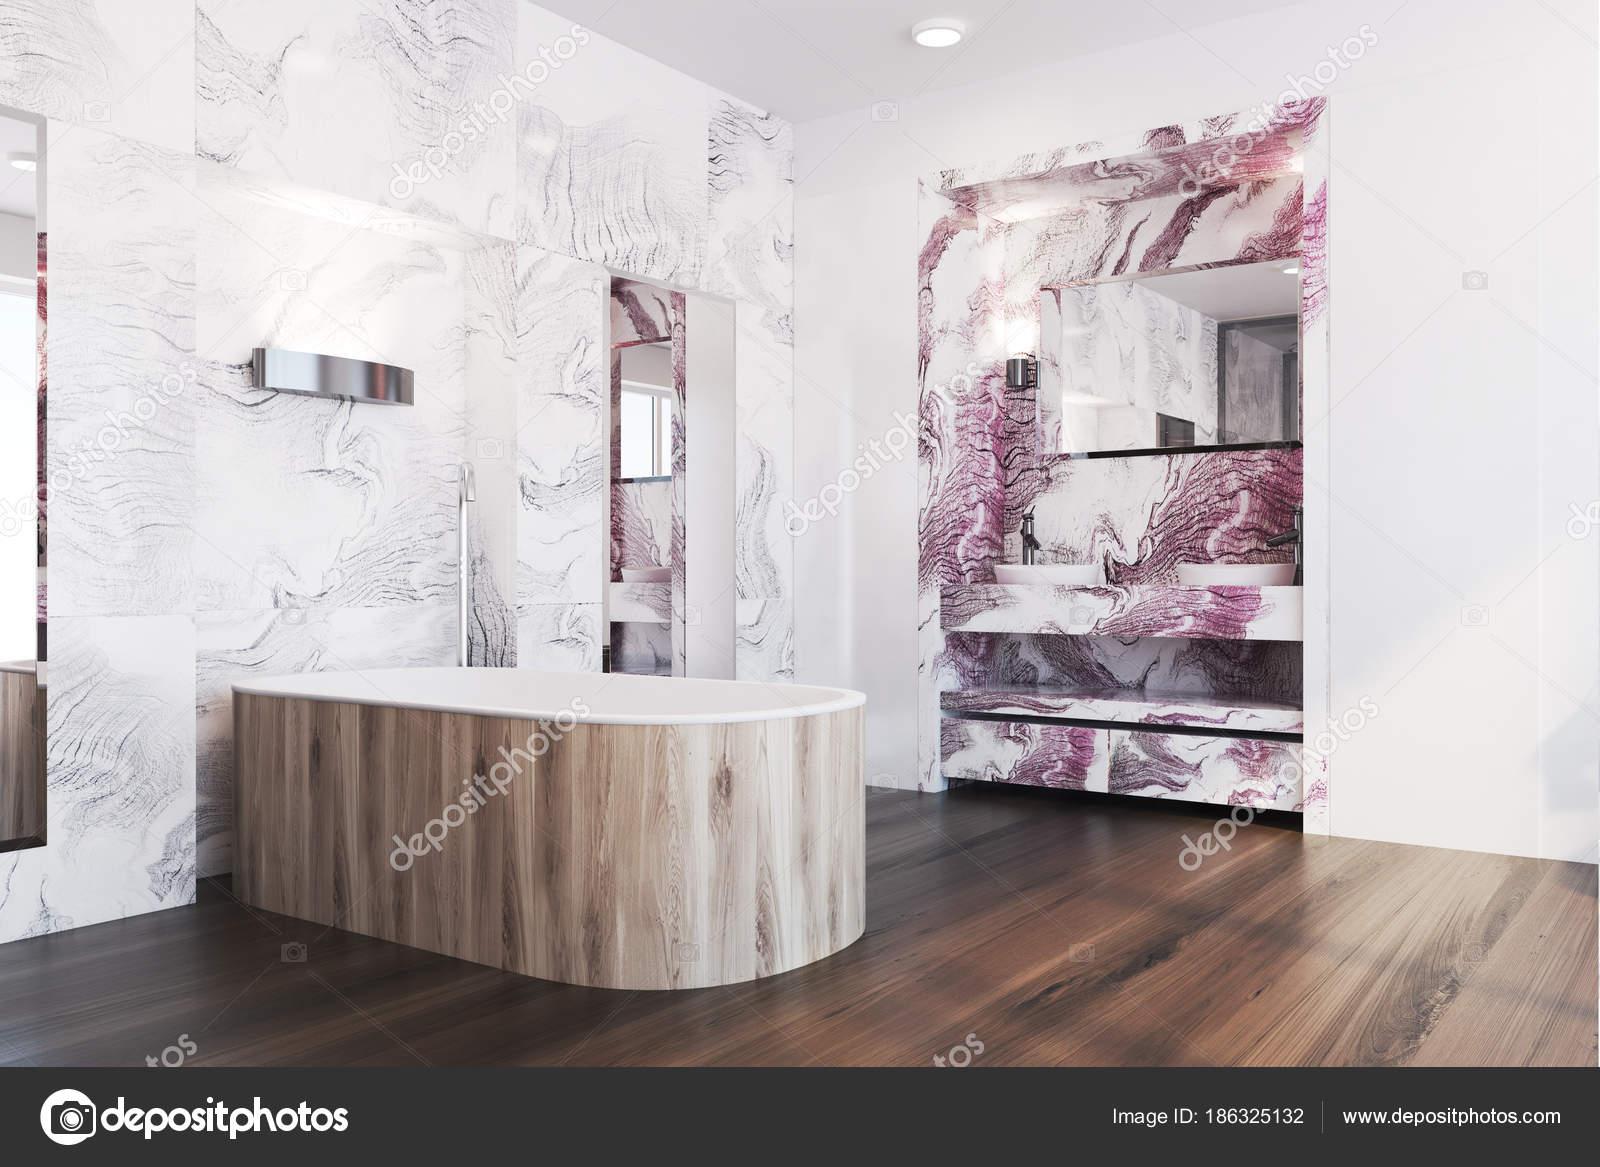 White And Red Marble Bathroom Corner Stock Photo C Denisismagilov 186325132